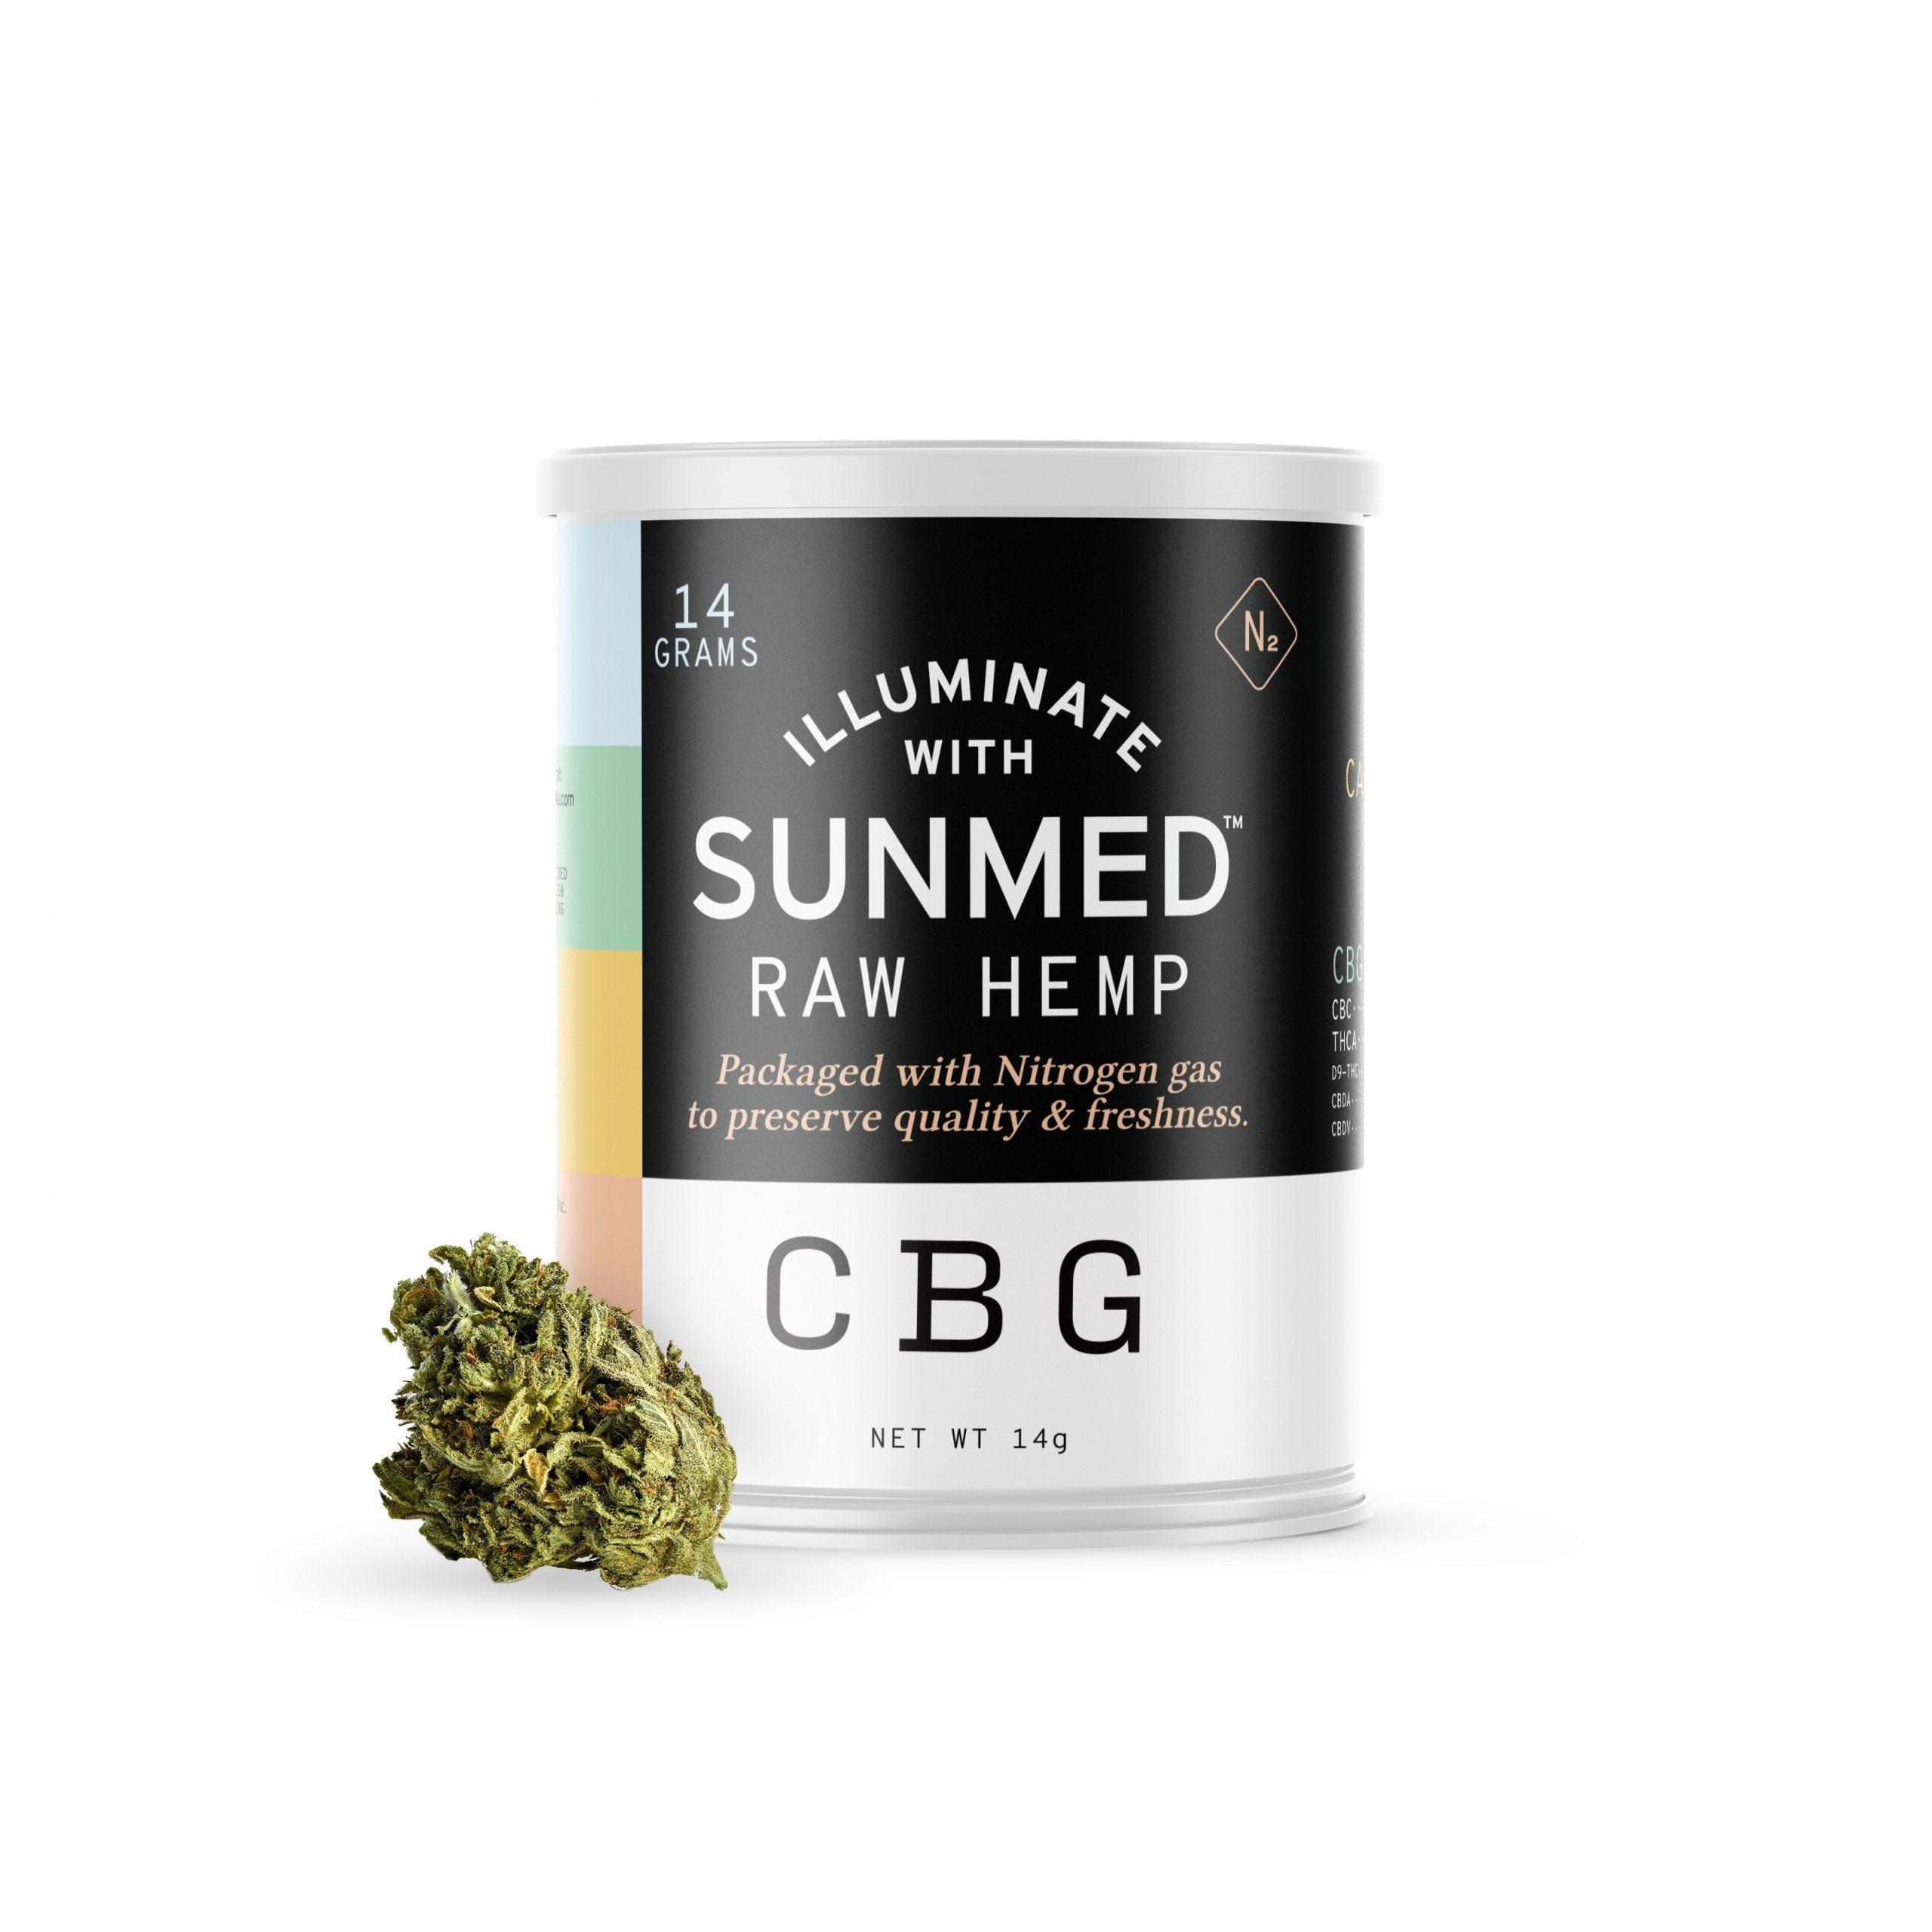 Sunmed CBD Flower CBG anxiety pain inflammation sunmed fort worth cbd store buy cbd oil online cannabinoid oil